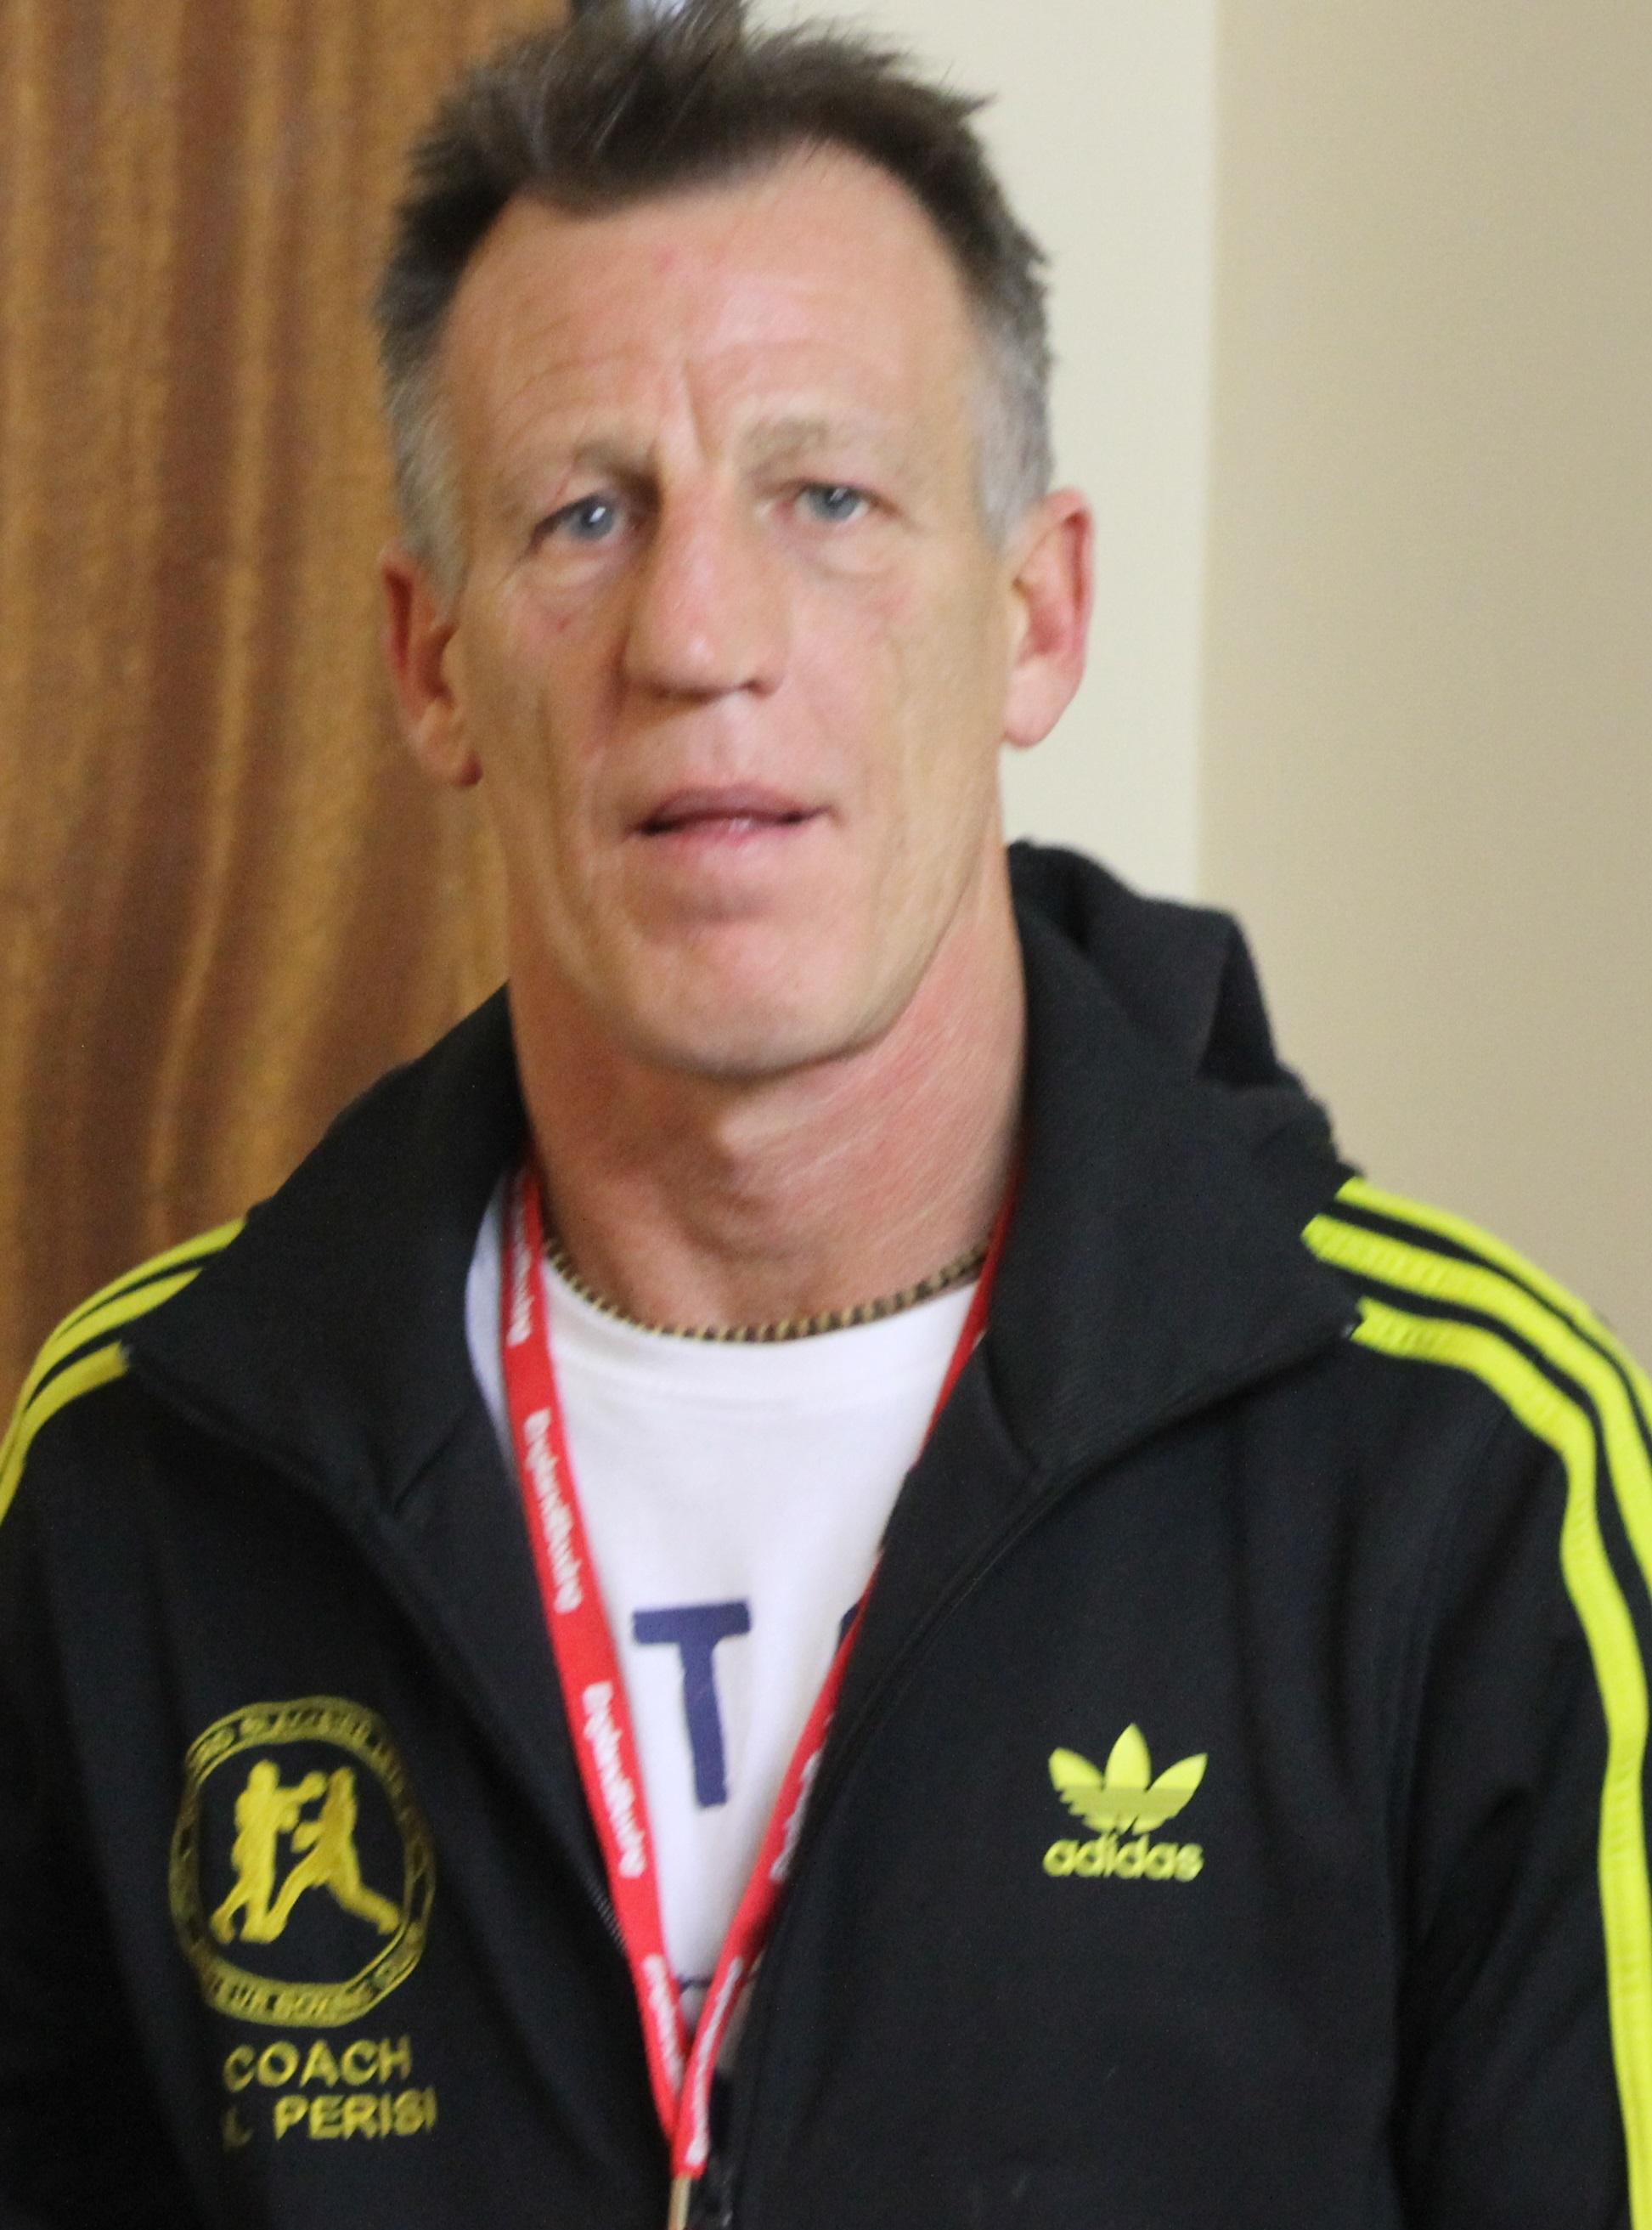 Keith Perisi blackbirdleys boxing club coach